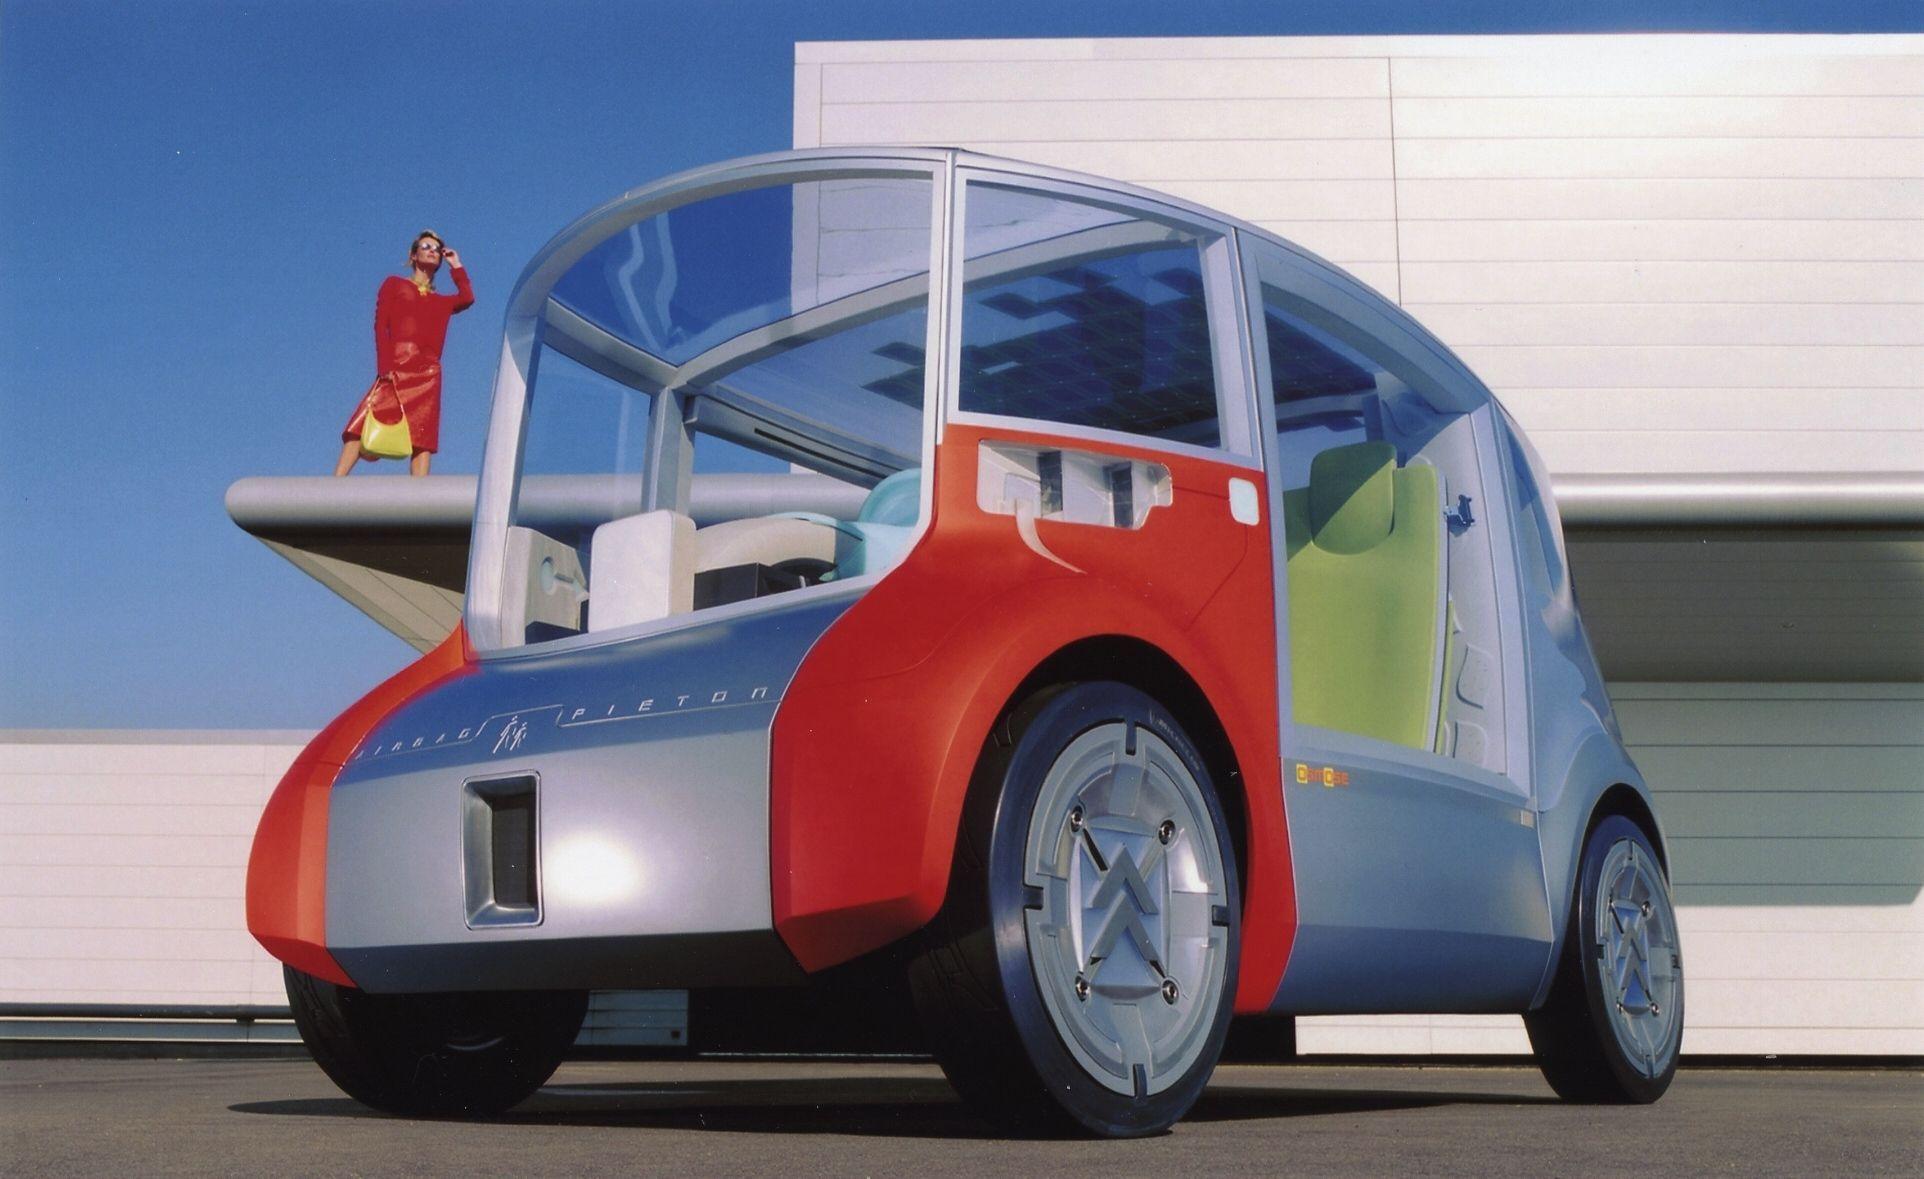 2020 - [Citroën] The Urban Collëctif - Page 2 02bb0281fbb3325fb6ae3bc0a48d65e5_resize=1924,1179_